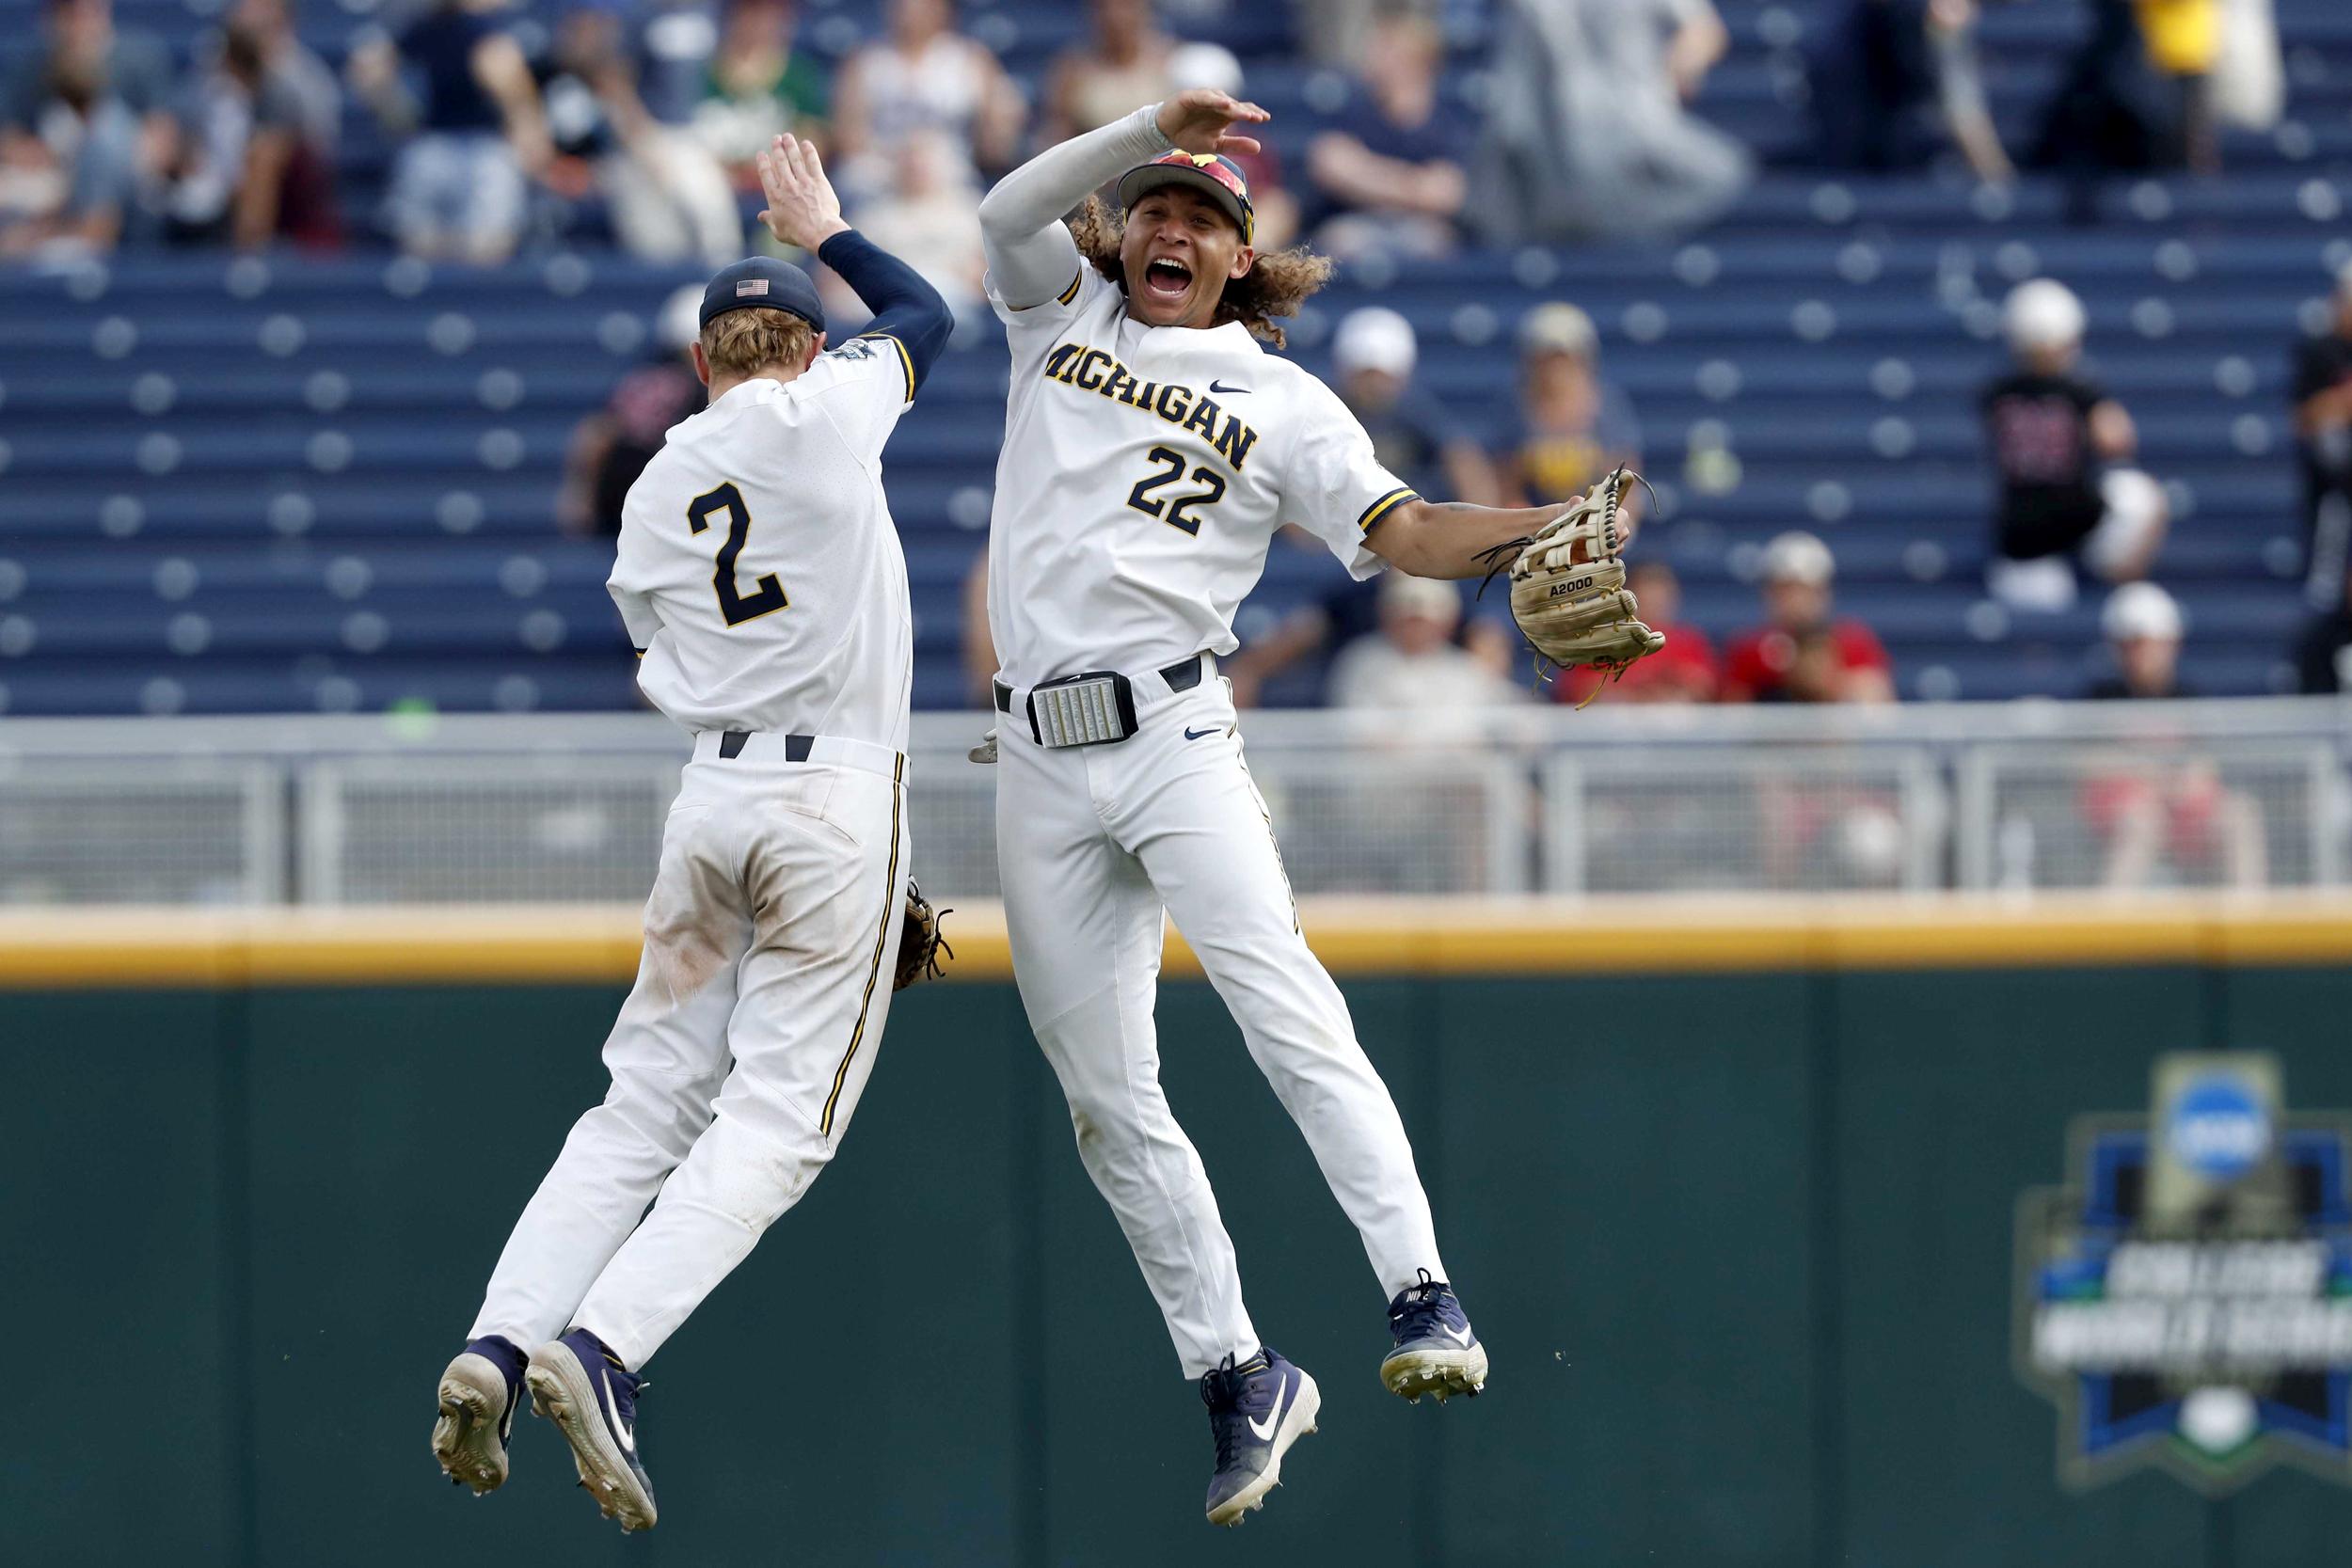 University-of-Michigan-could-snap-championship-cold-streak-for-northern-baseball-teams